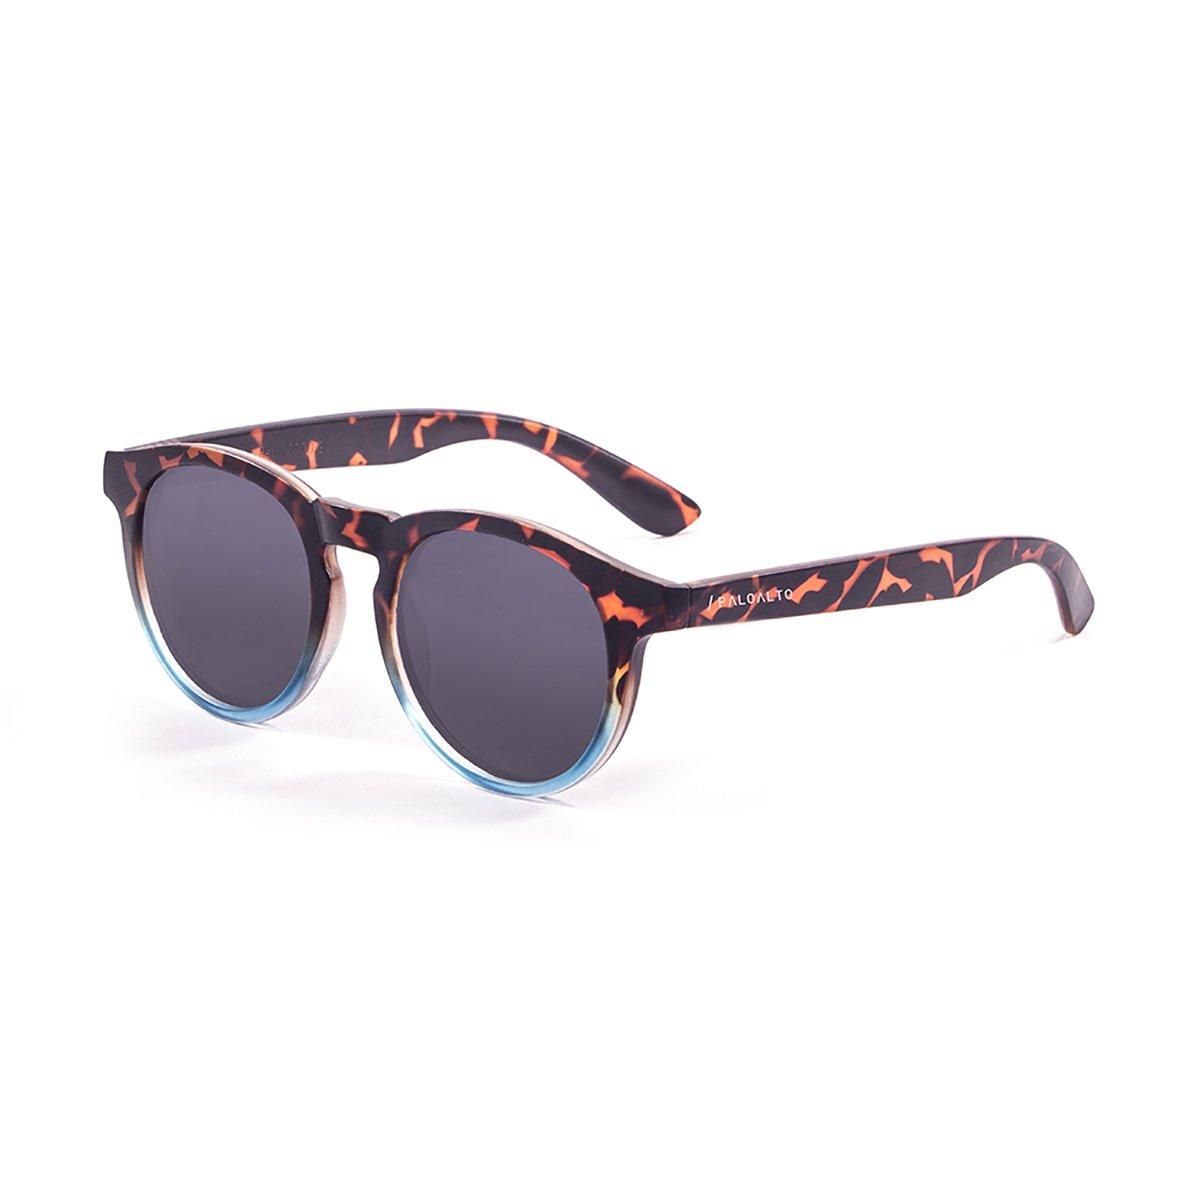 Paloalto Sunglasses Newport Gafas de Sol Unisex, Demy Brown ...